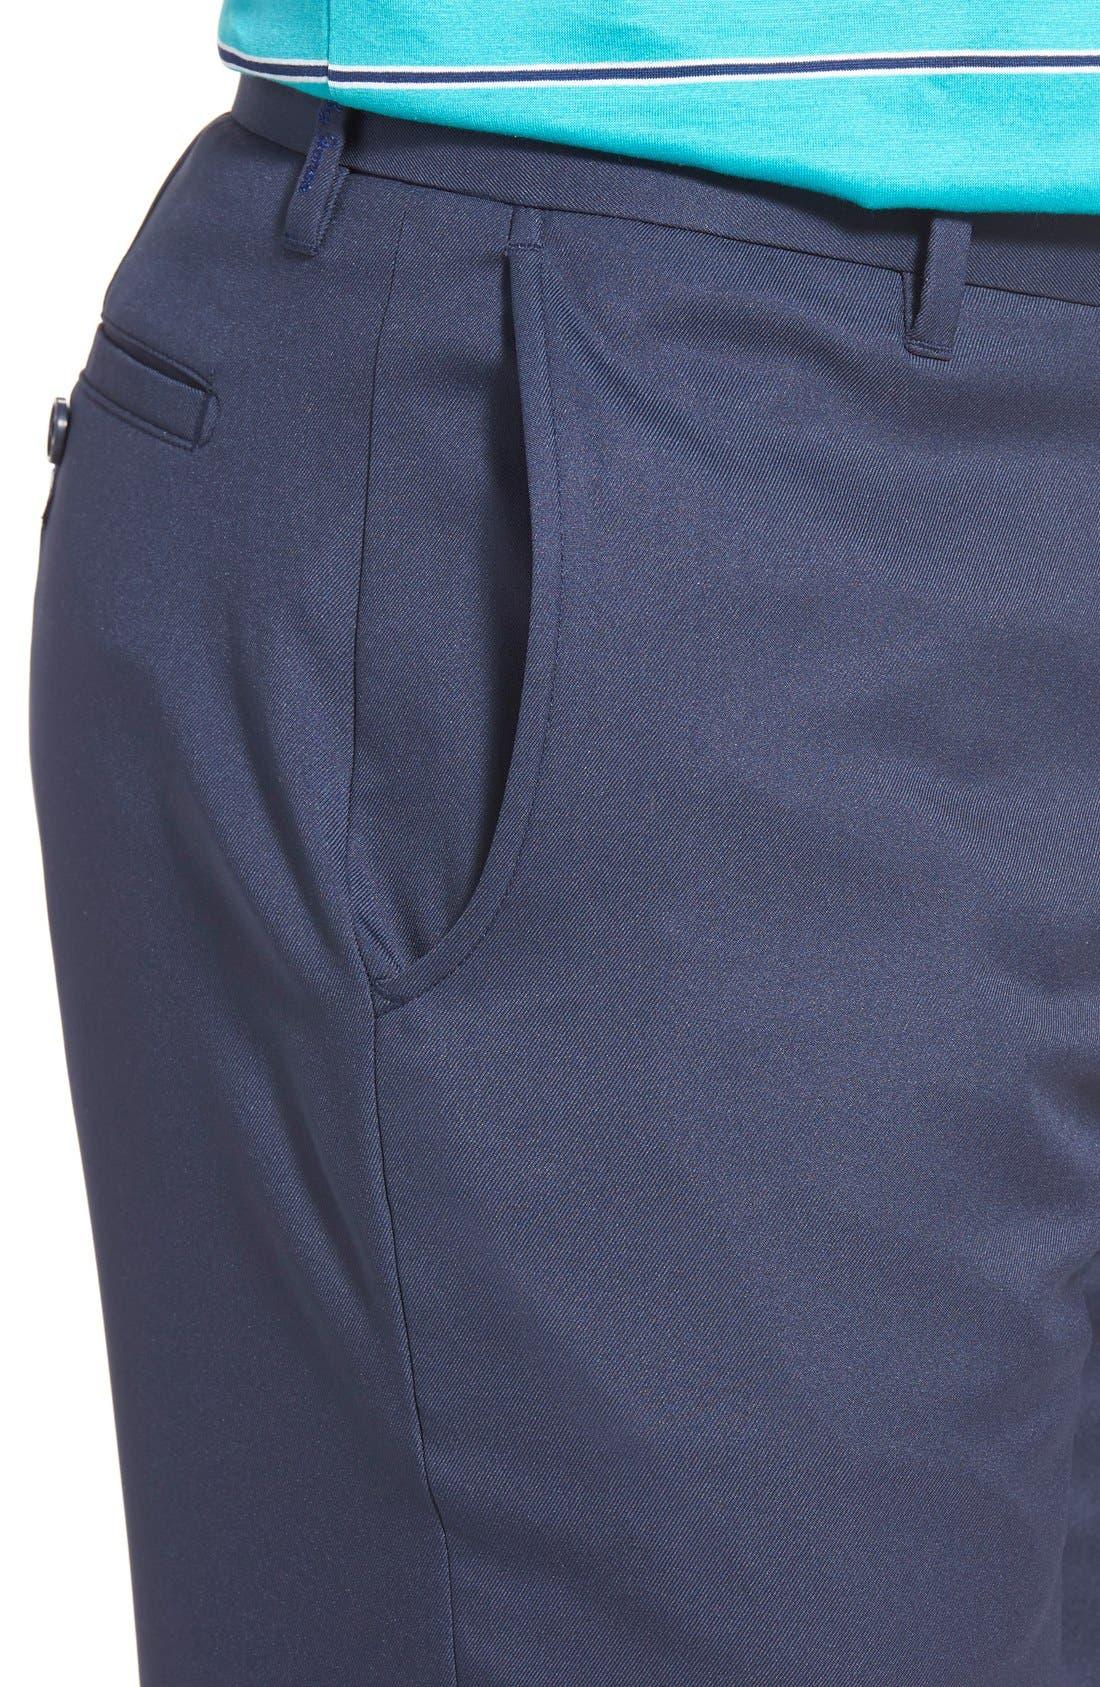 'Tech' Flat Front Wrinkle Free Golf Pants,                             Alternate thumbnail 17, color,